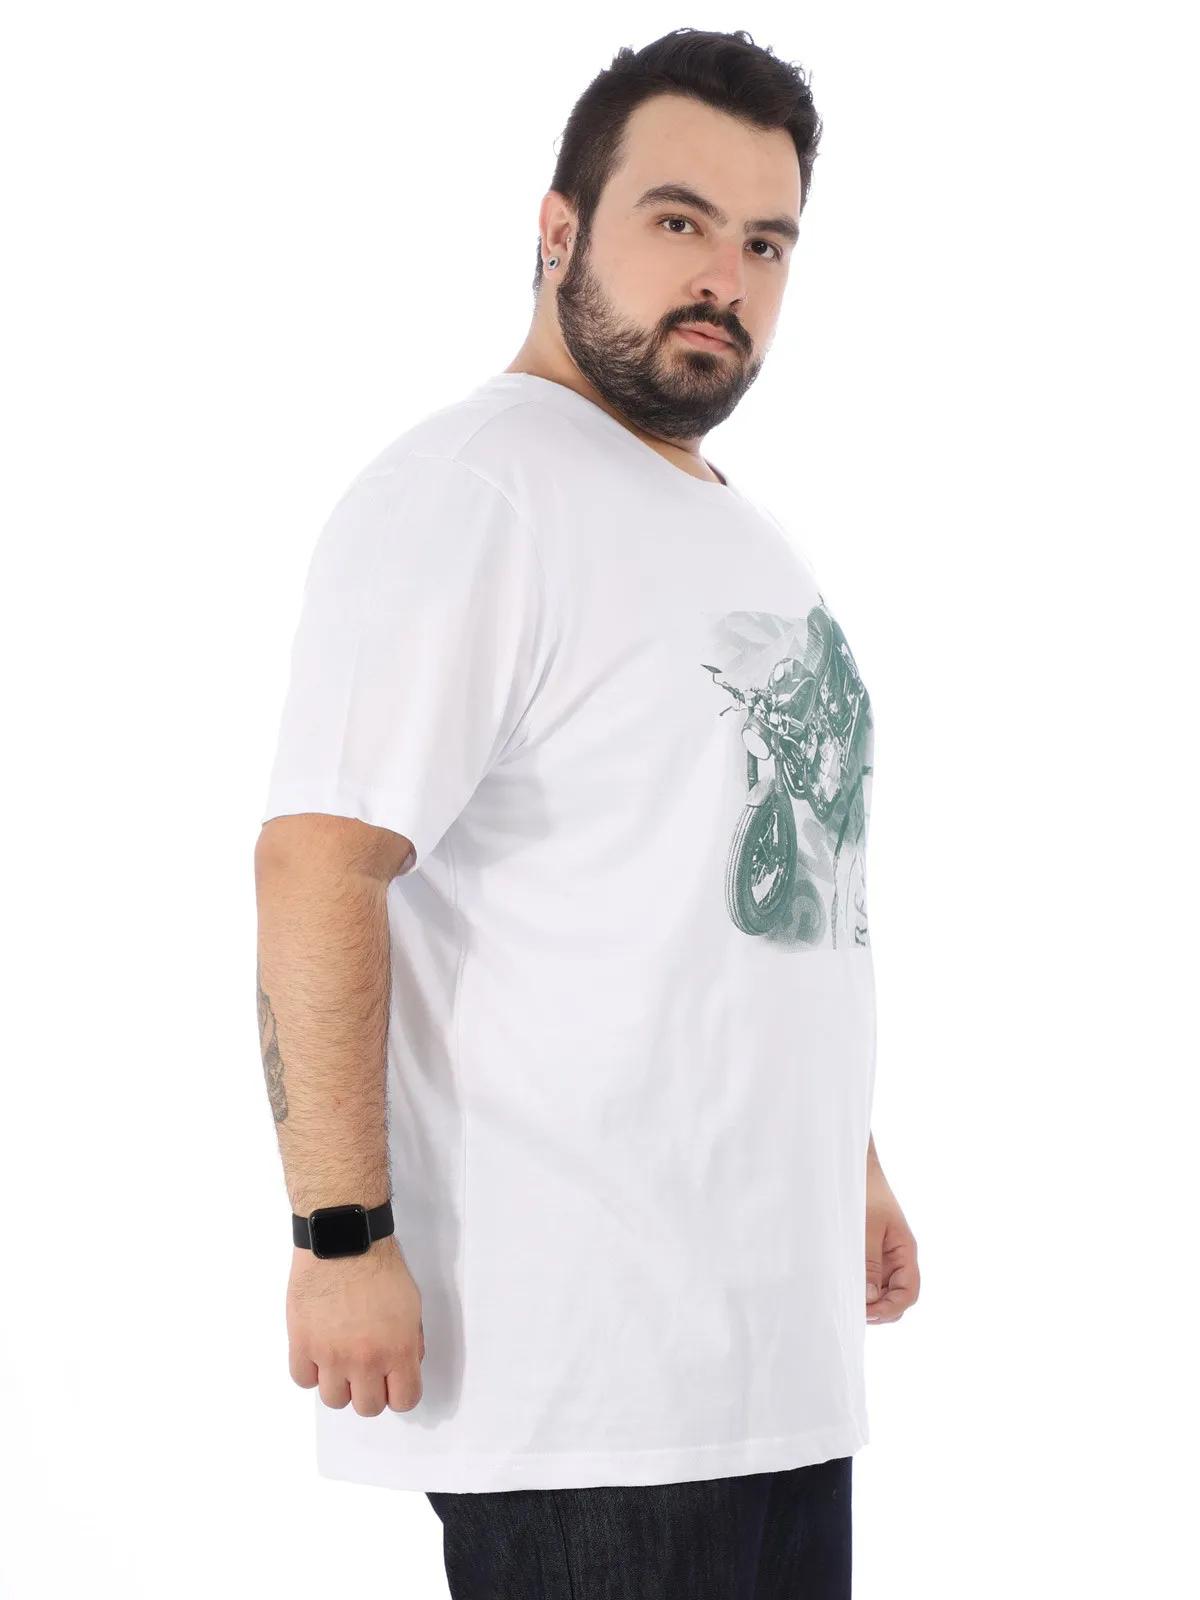 Camiseta Plus Size Masculina Estampada Manga Curta Branca